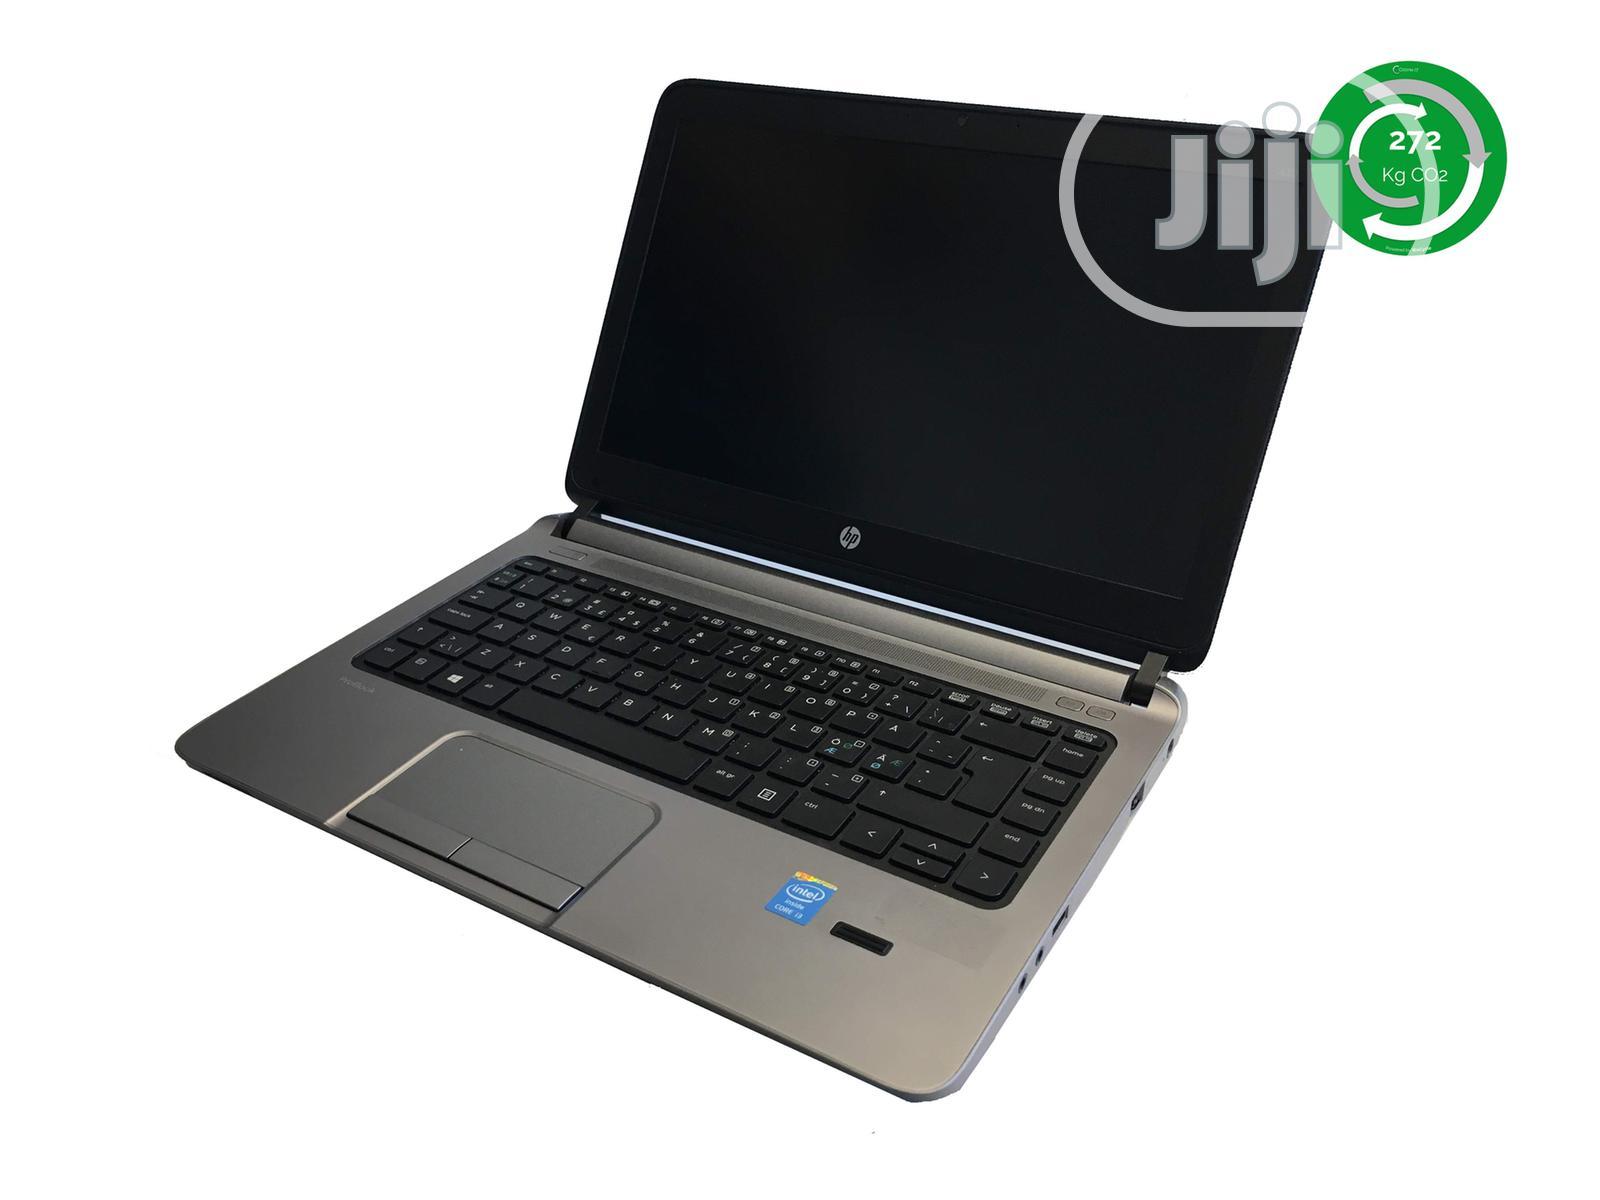 Laptop HP 430 G1 8GB Intel Core i5 HDD 500GB